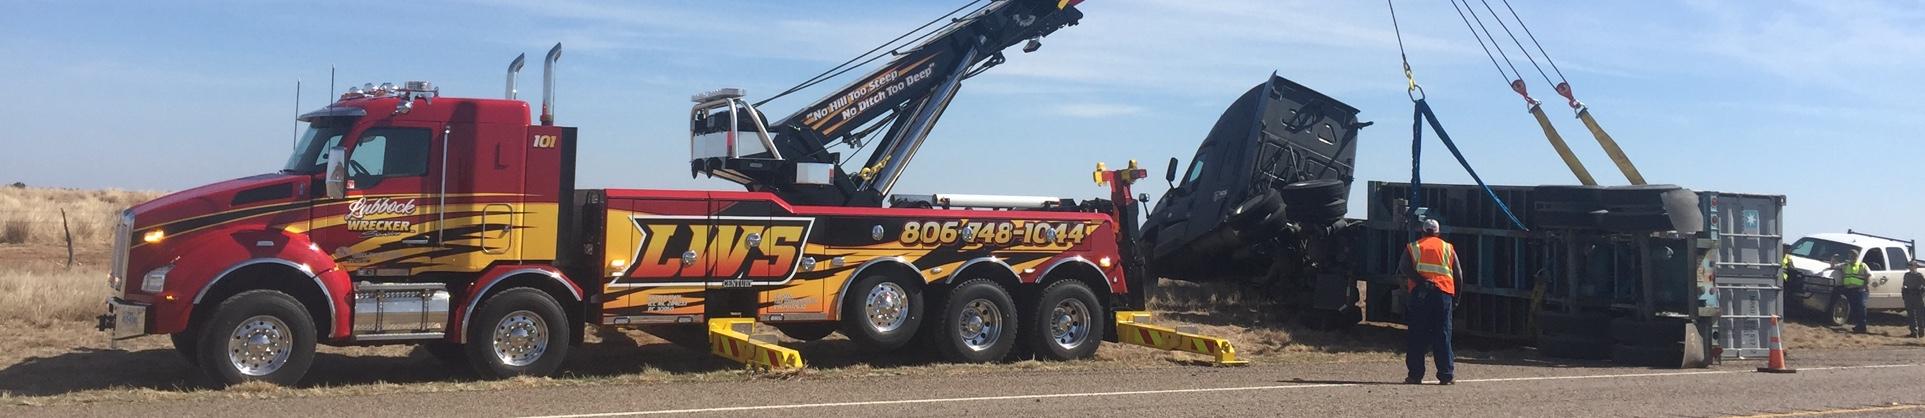 Large Truck Tow Rotator